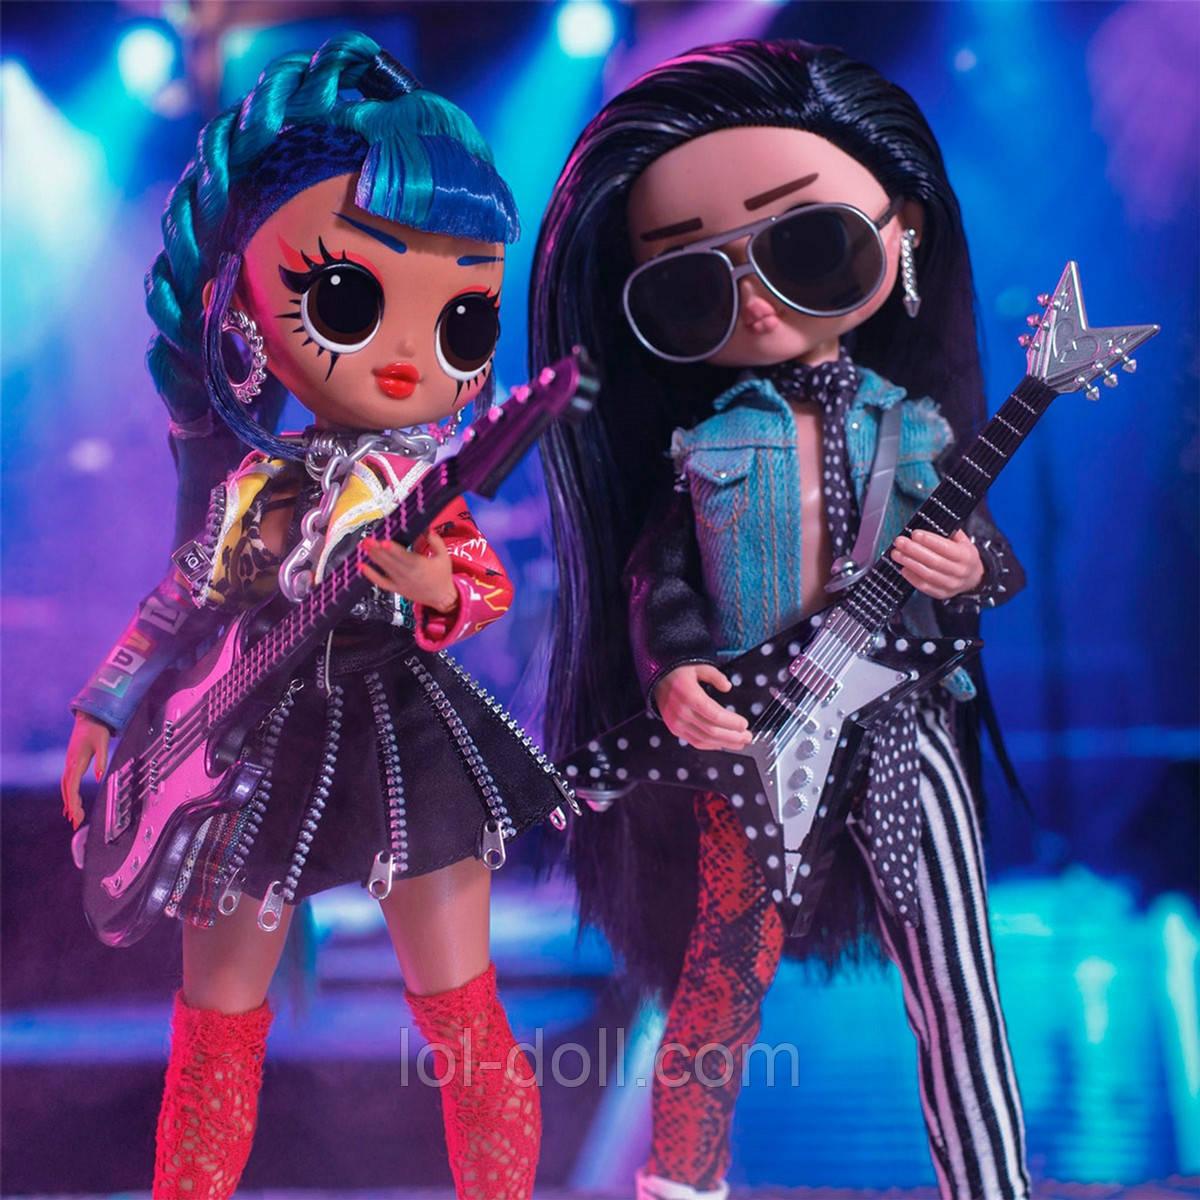 Кукла ЛОЛ ОМГ Дуэт Оригинал L.O.L. Surprise! O.M.G. Remix Rocker Boi and Punk Grrrl